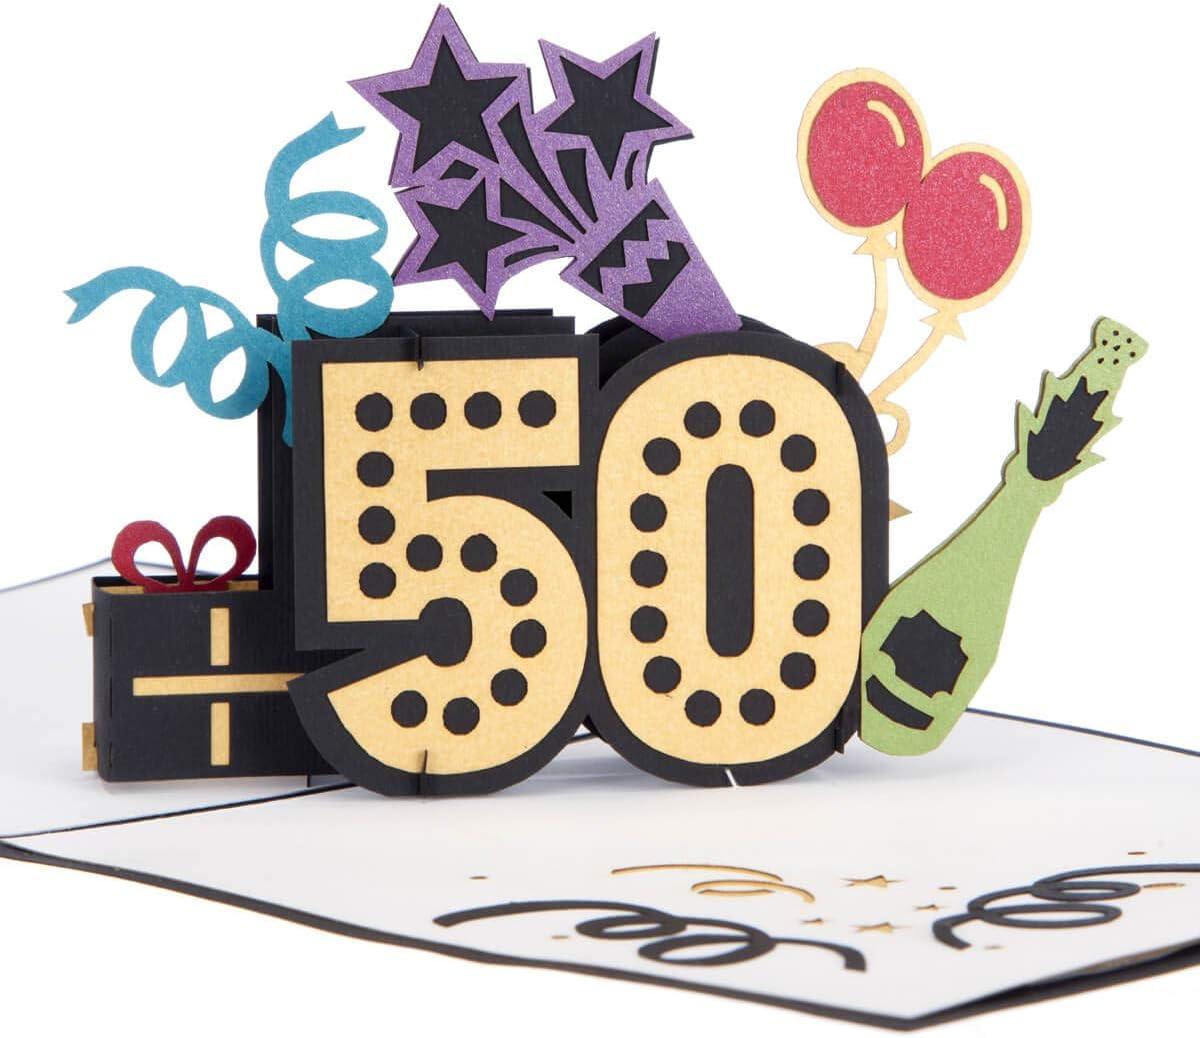 Cardology 50th Birthday Pop Up Card 50th Birthday Cards 50th Birthday Cards For Wife 50th Birthday Gifts 50th Birthday Ideas Handmade Amazon Co Uk Office Products